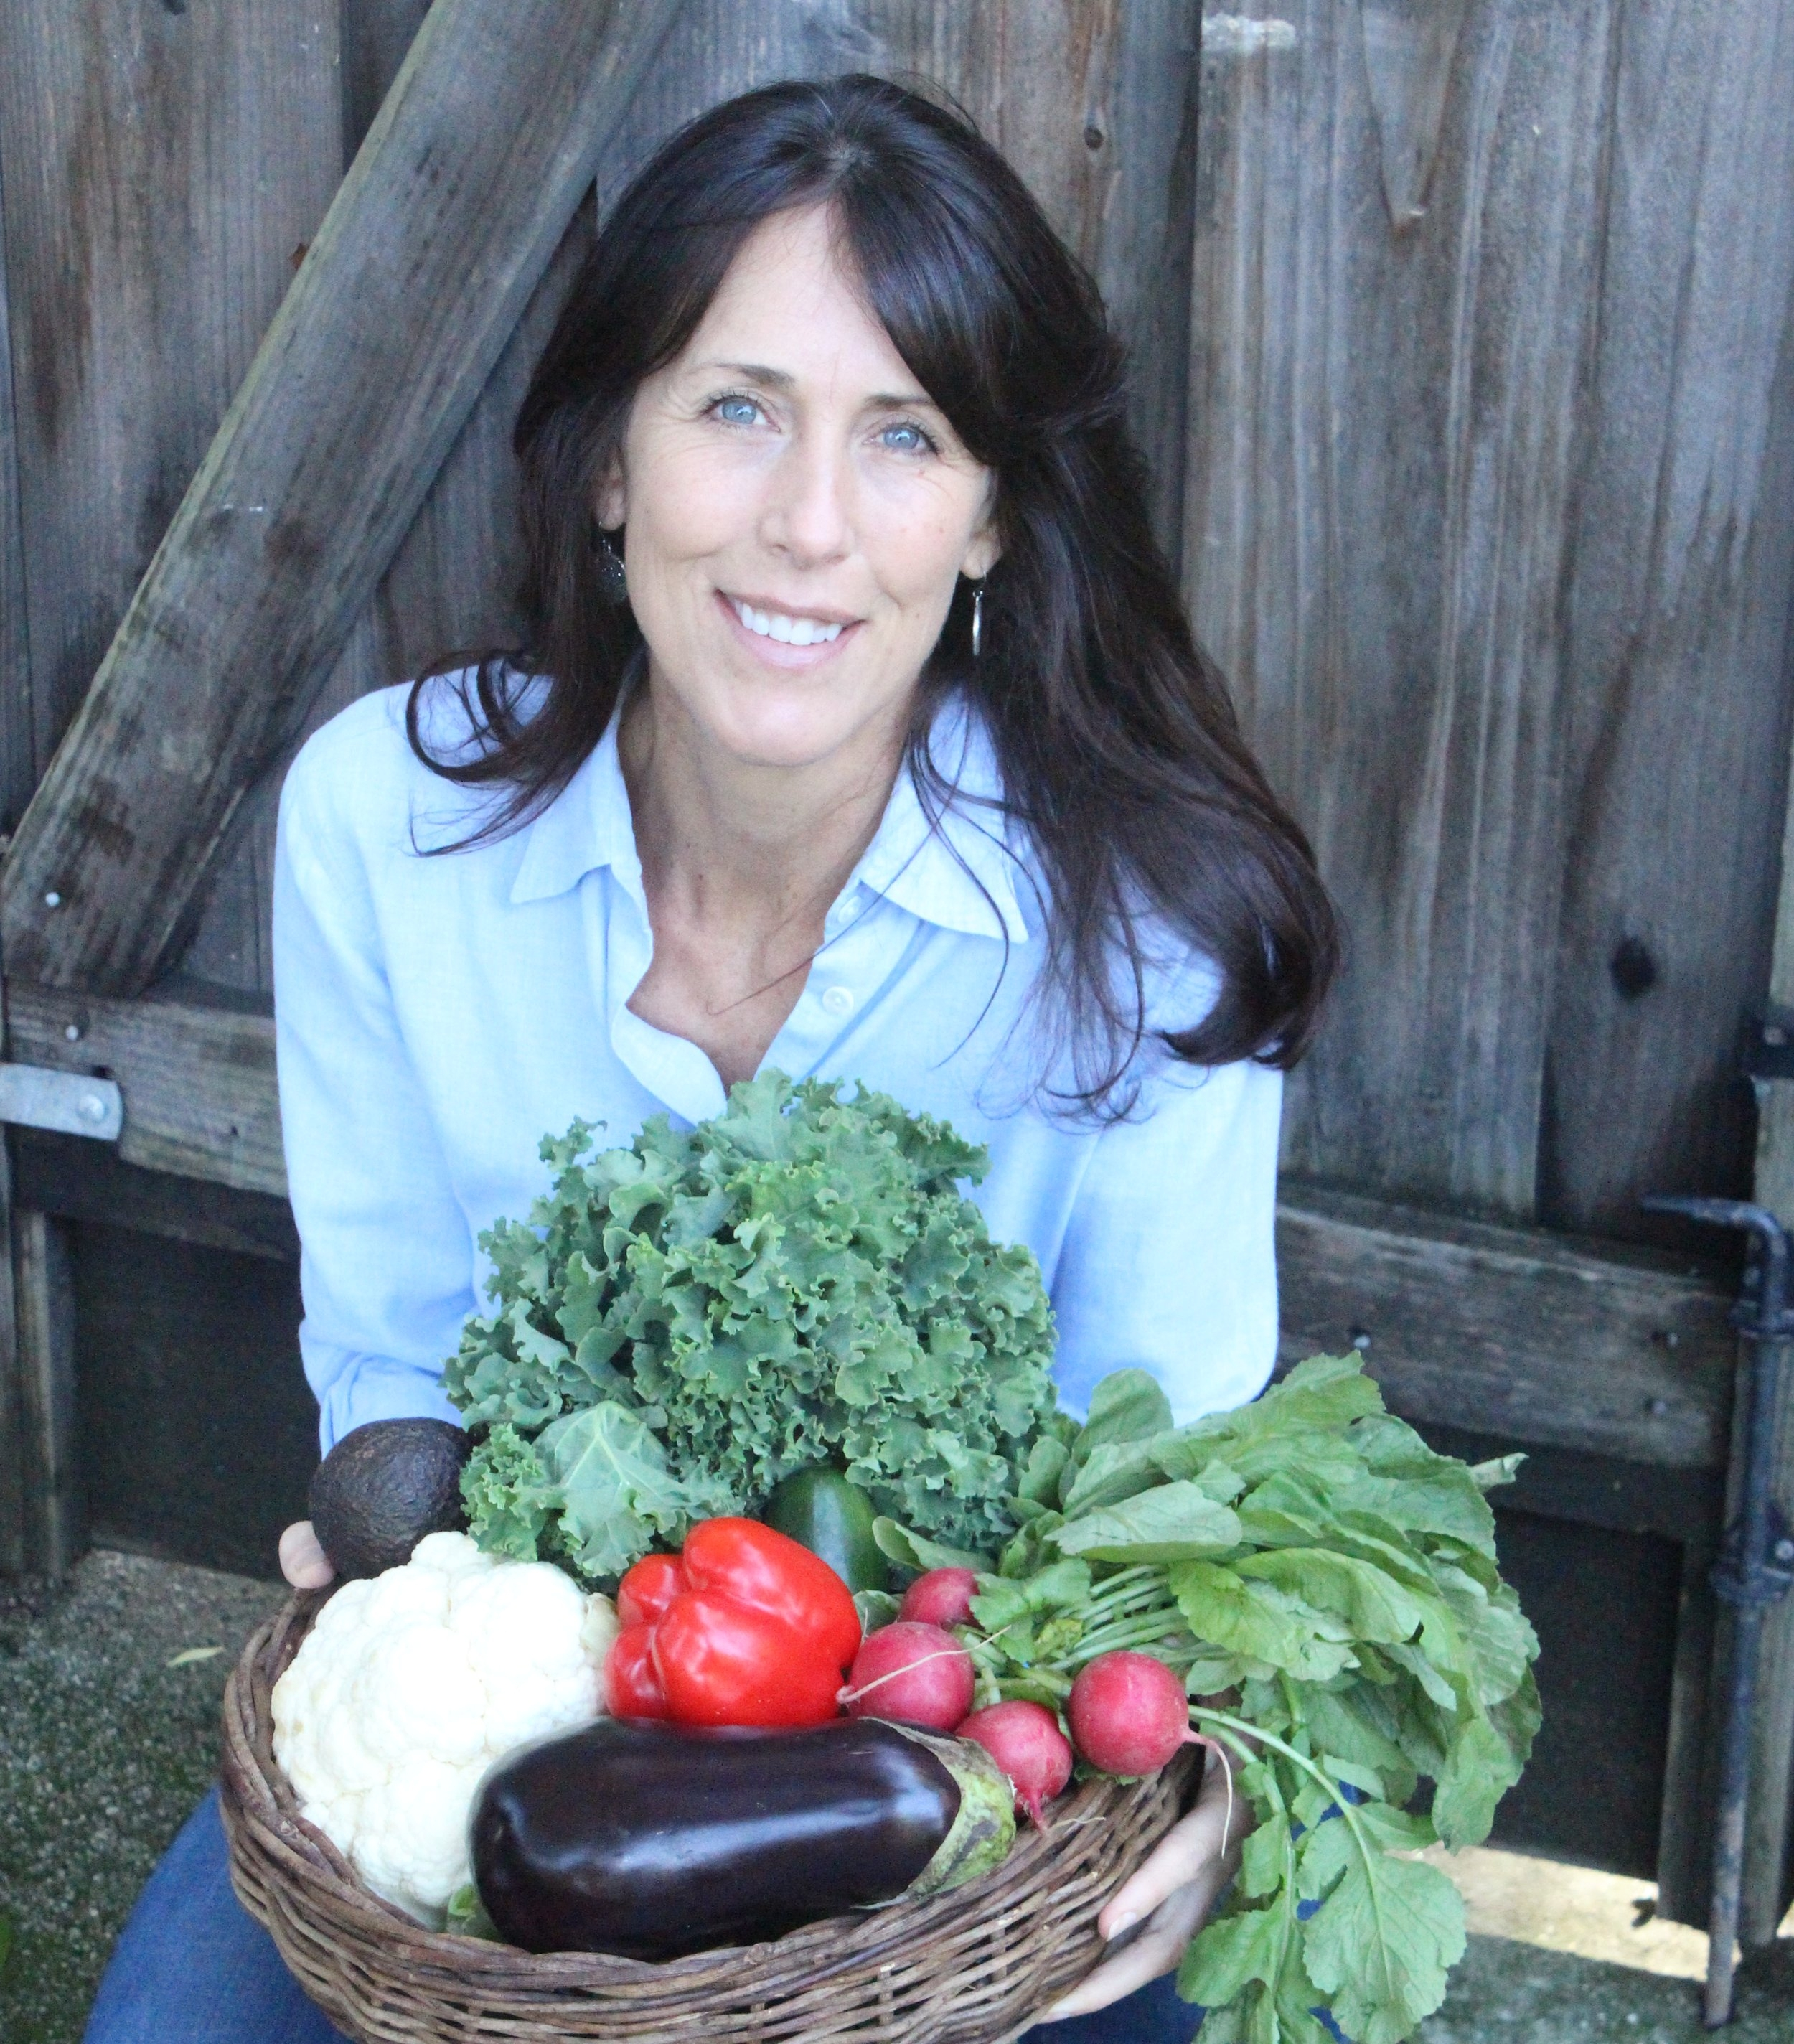 Deborah Blake, N.C and Co-Owner of Bites Beyond Limits